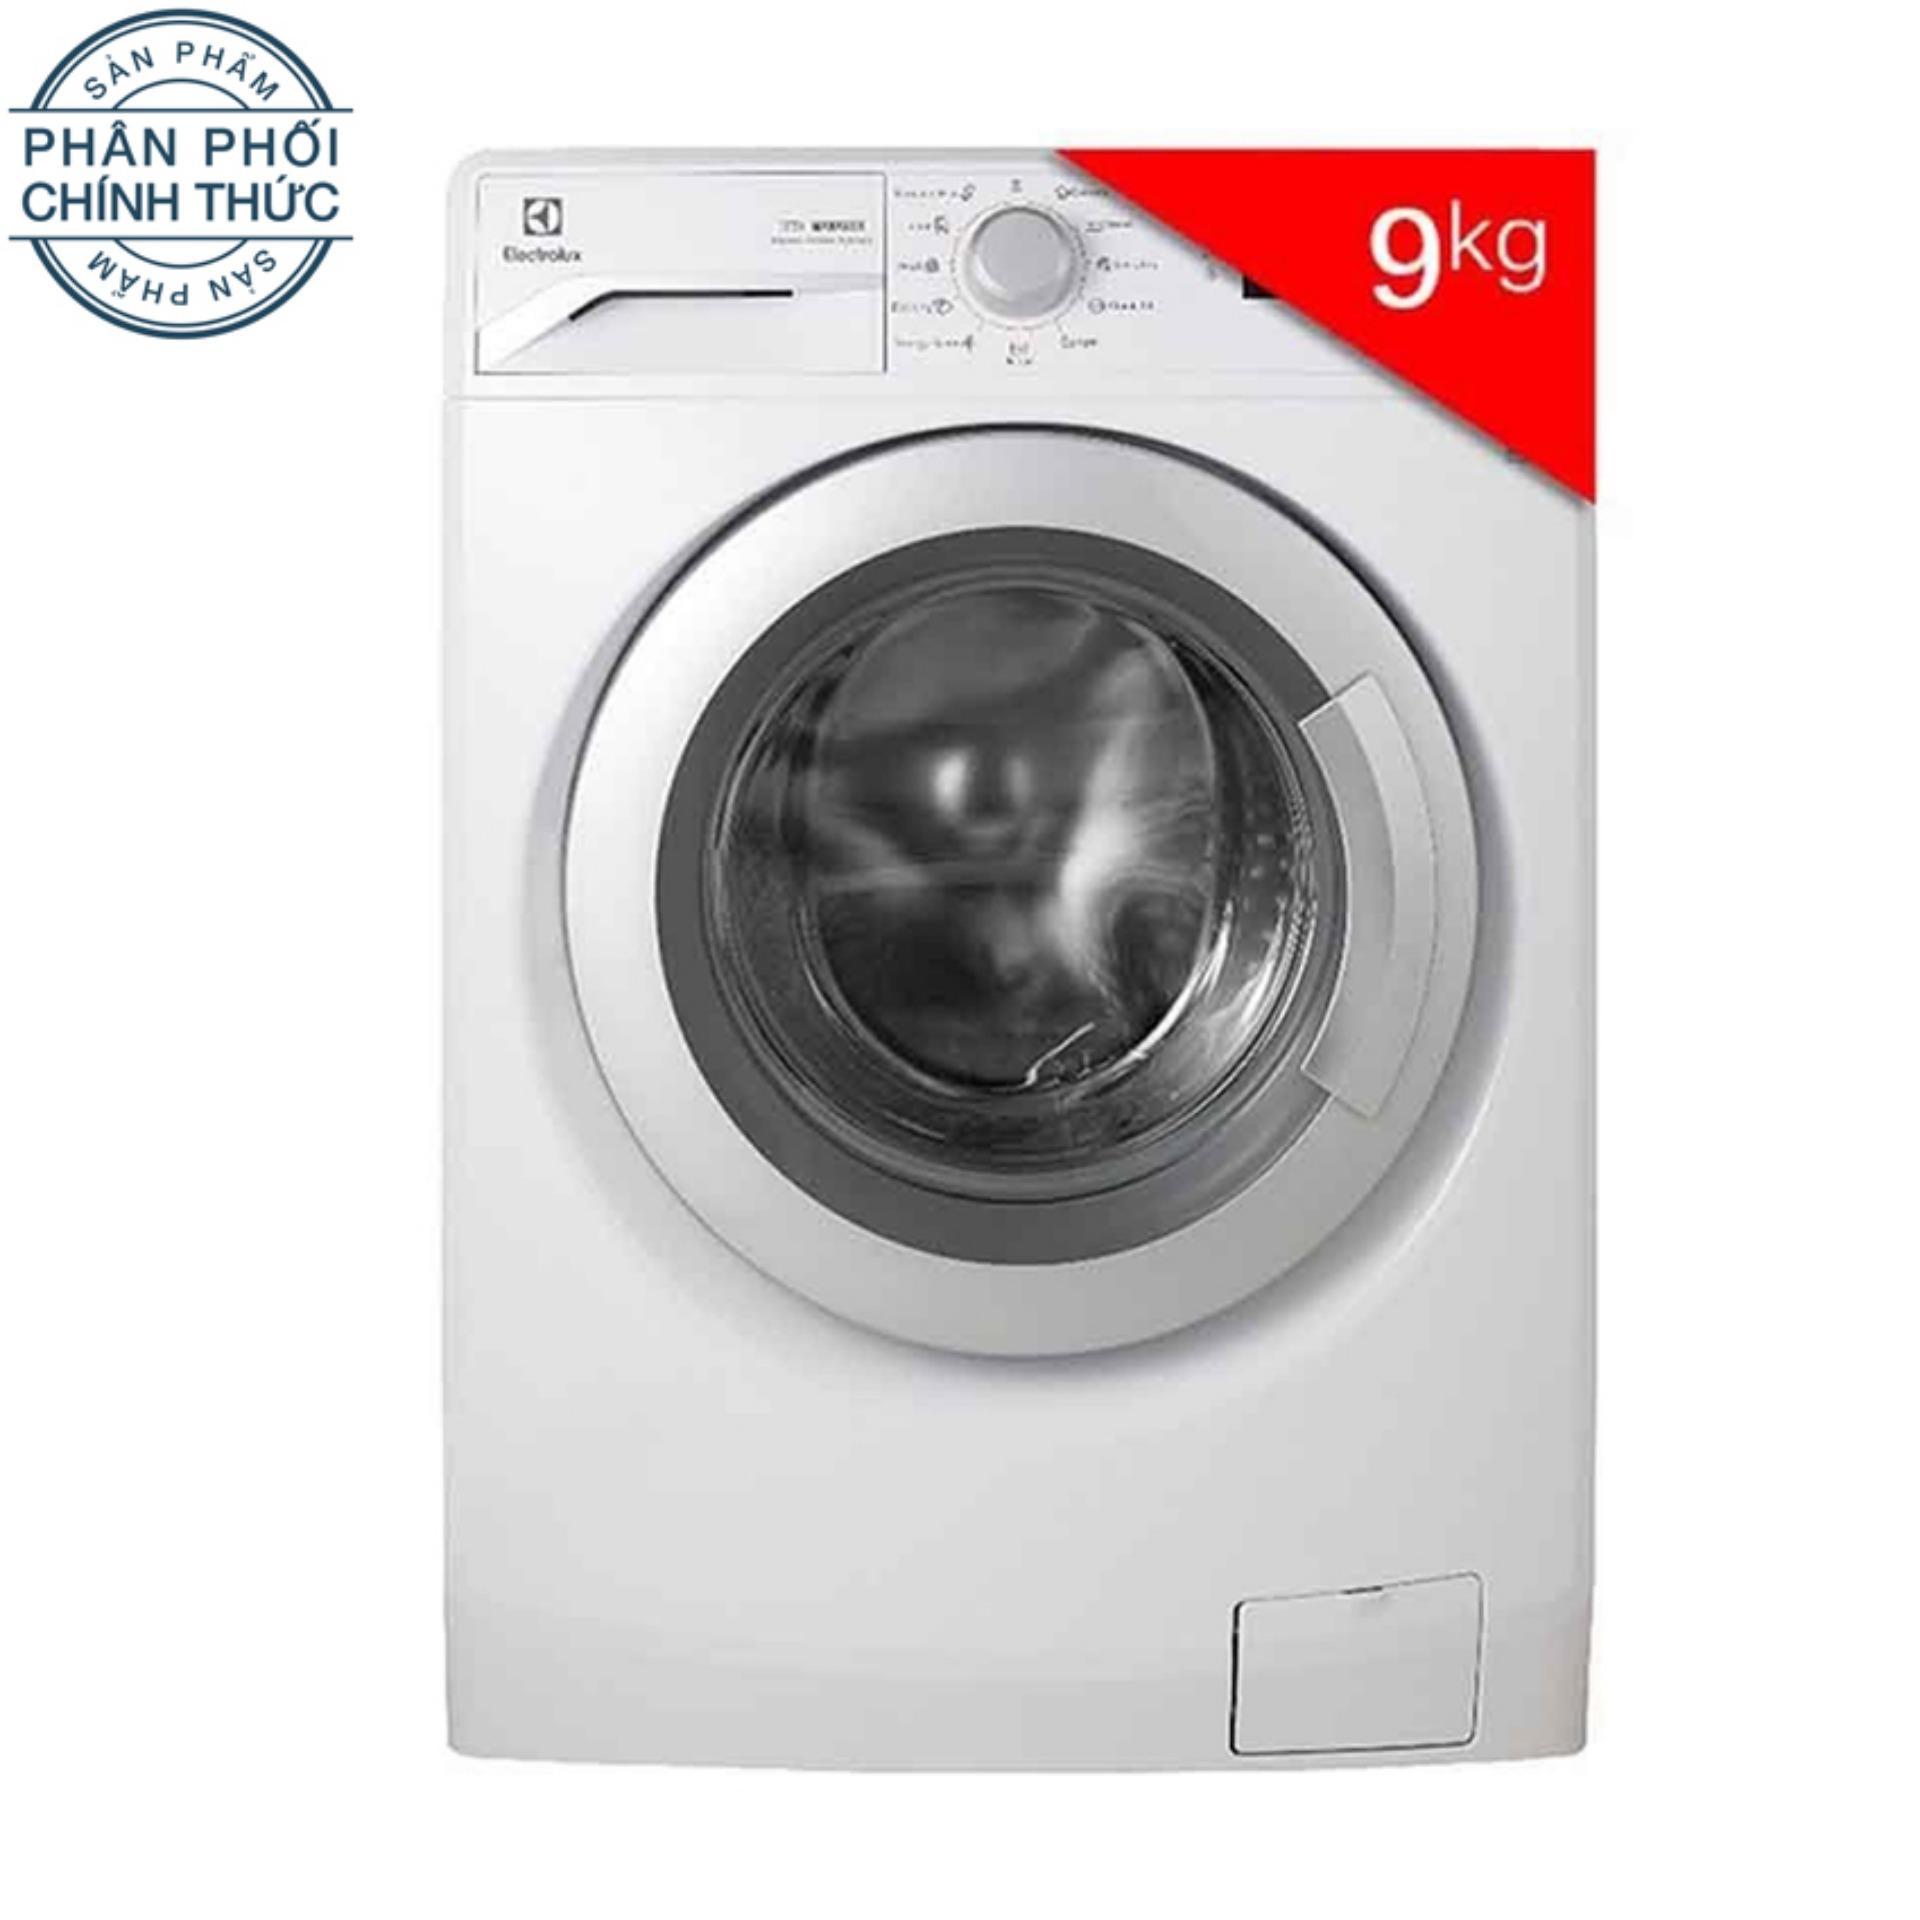 Máy Giặt Cửa Trước Inverter Electrolux EWF12942 9Kg (Trắng)